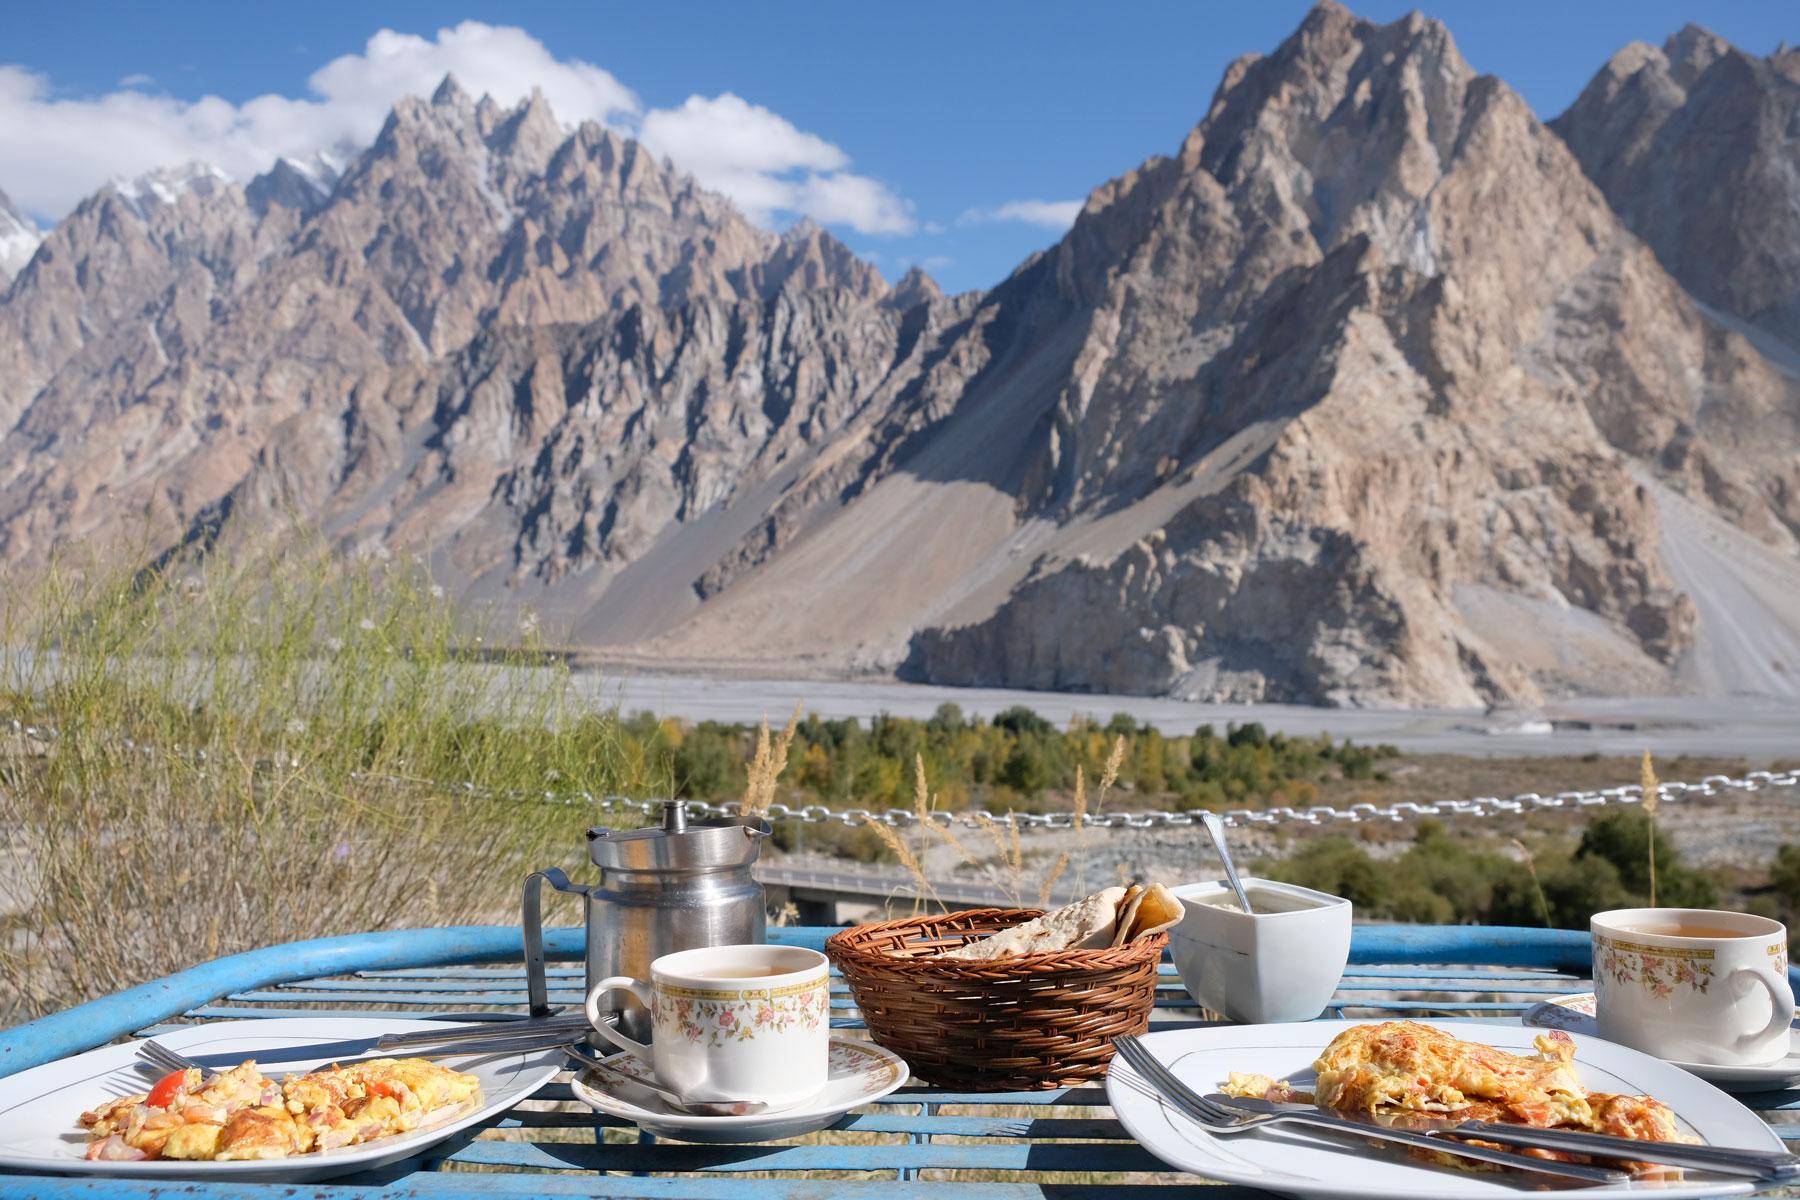 Frühstückstisch im Karakorumgebirge.